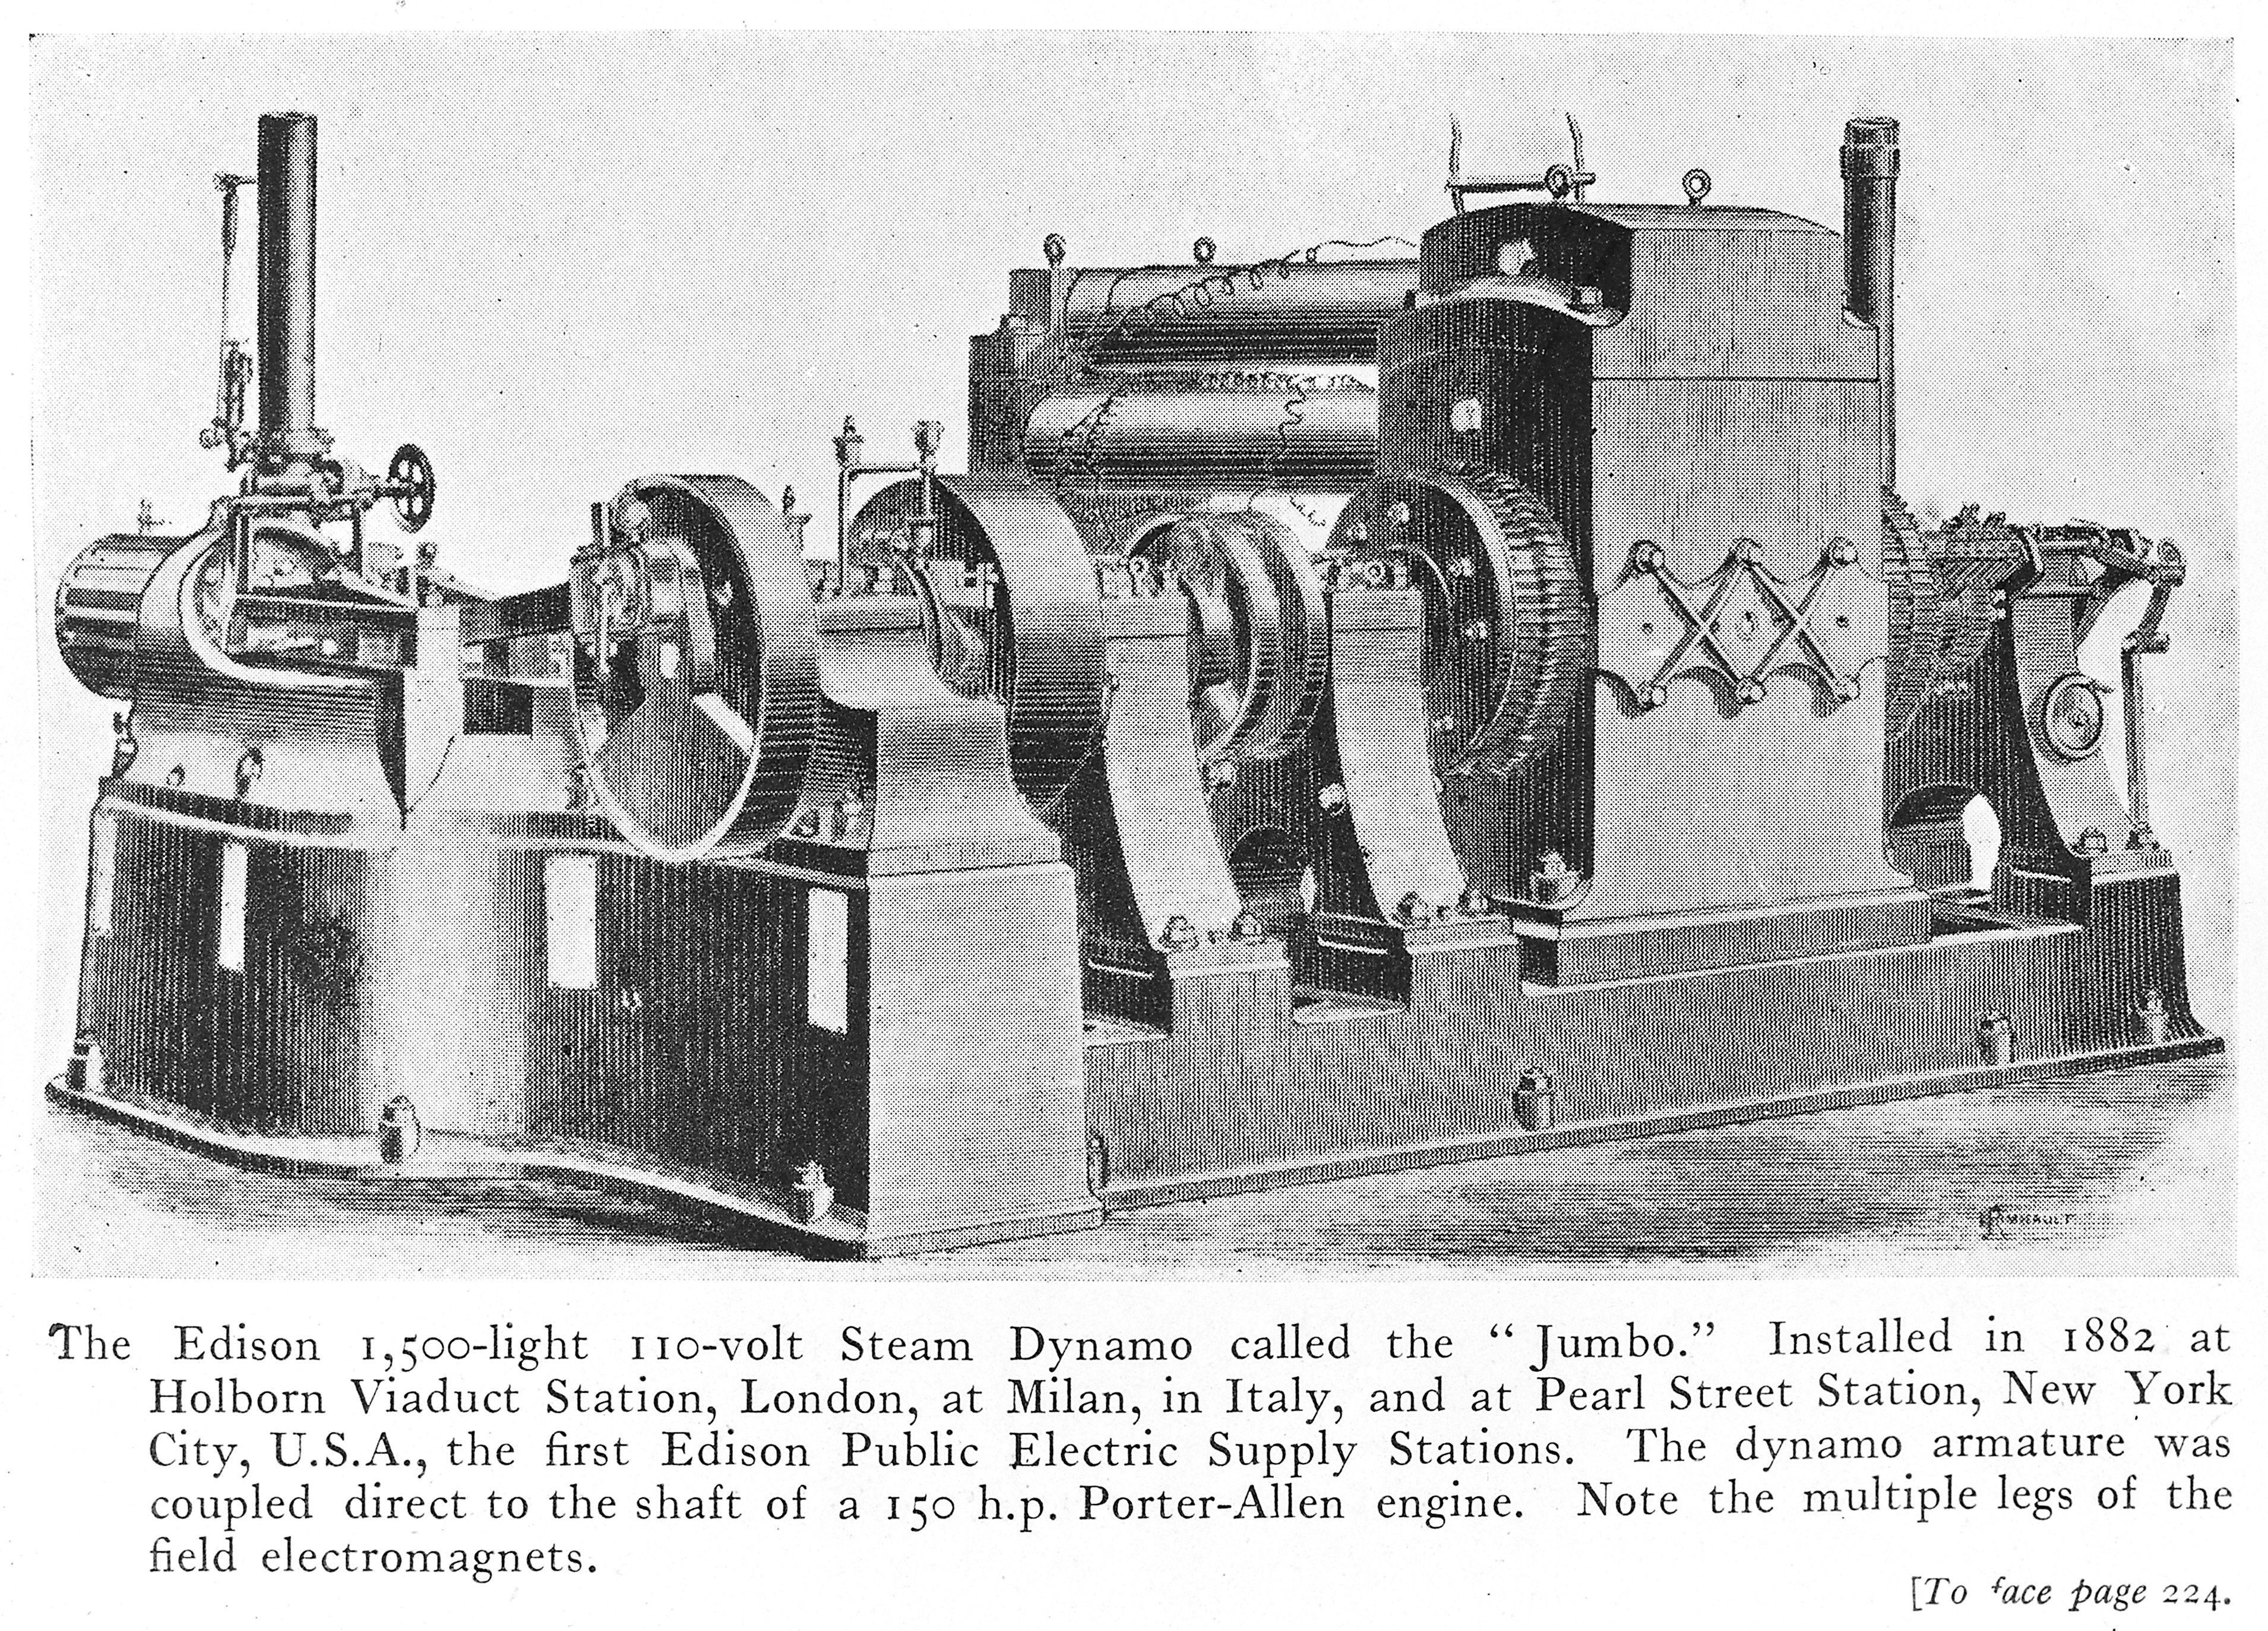 The Edison 1,500 light 110 volt steam dynamo called the